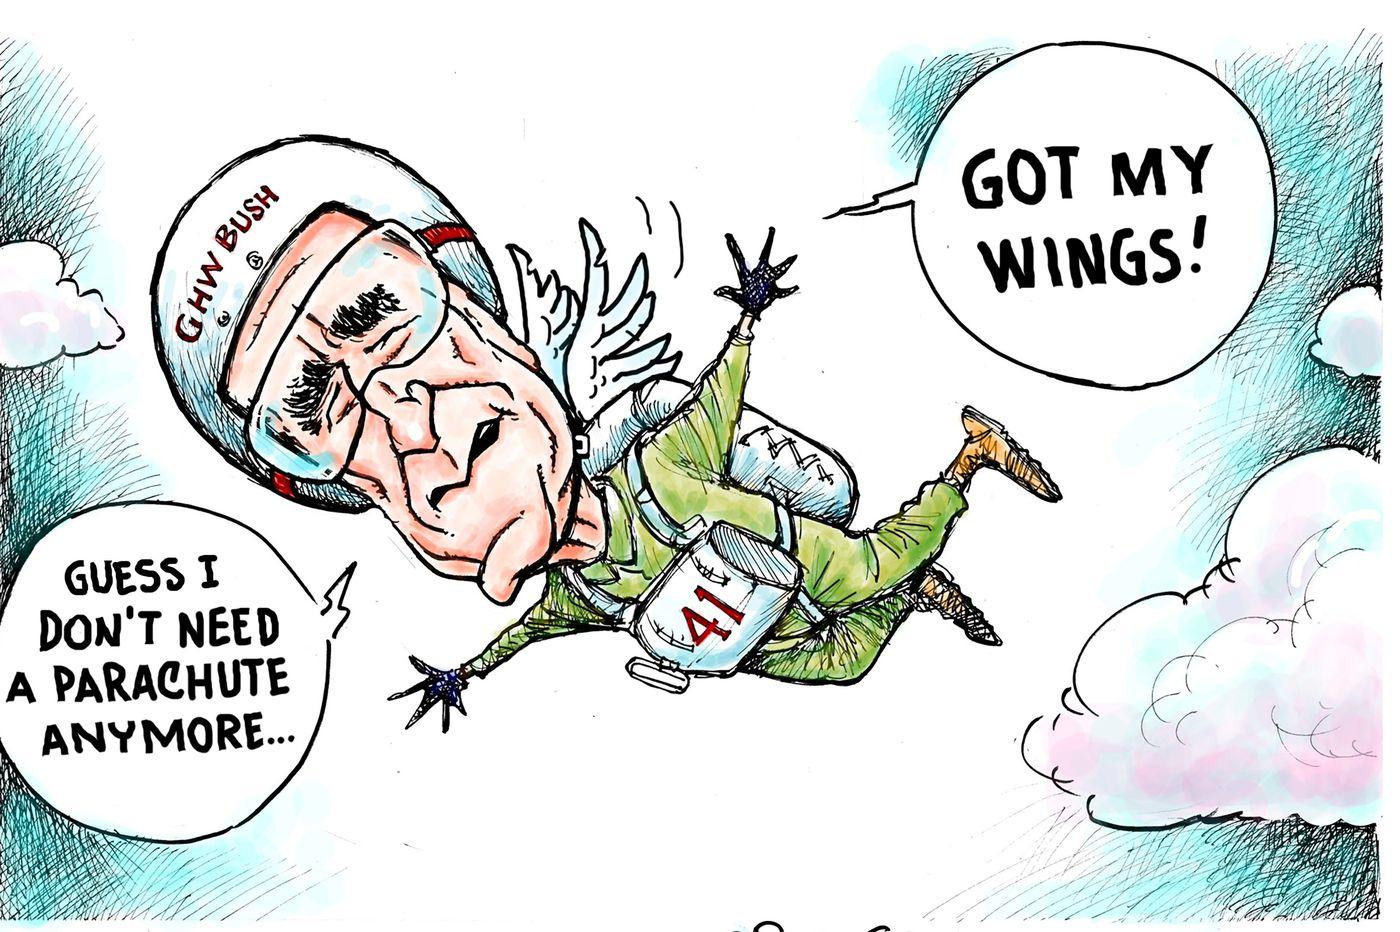 10 cartoons honoring George H.W. Bush's memory | Opinion